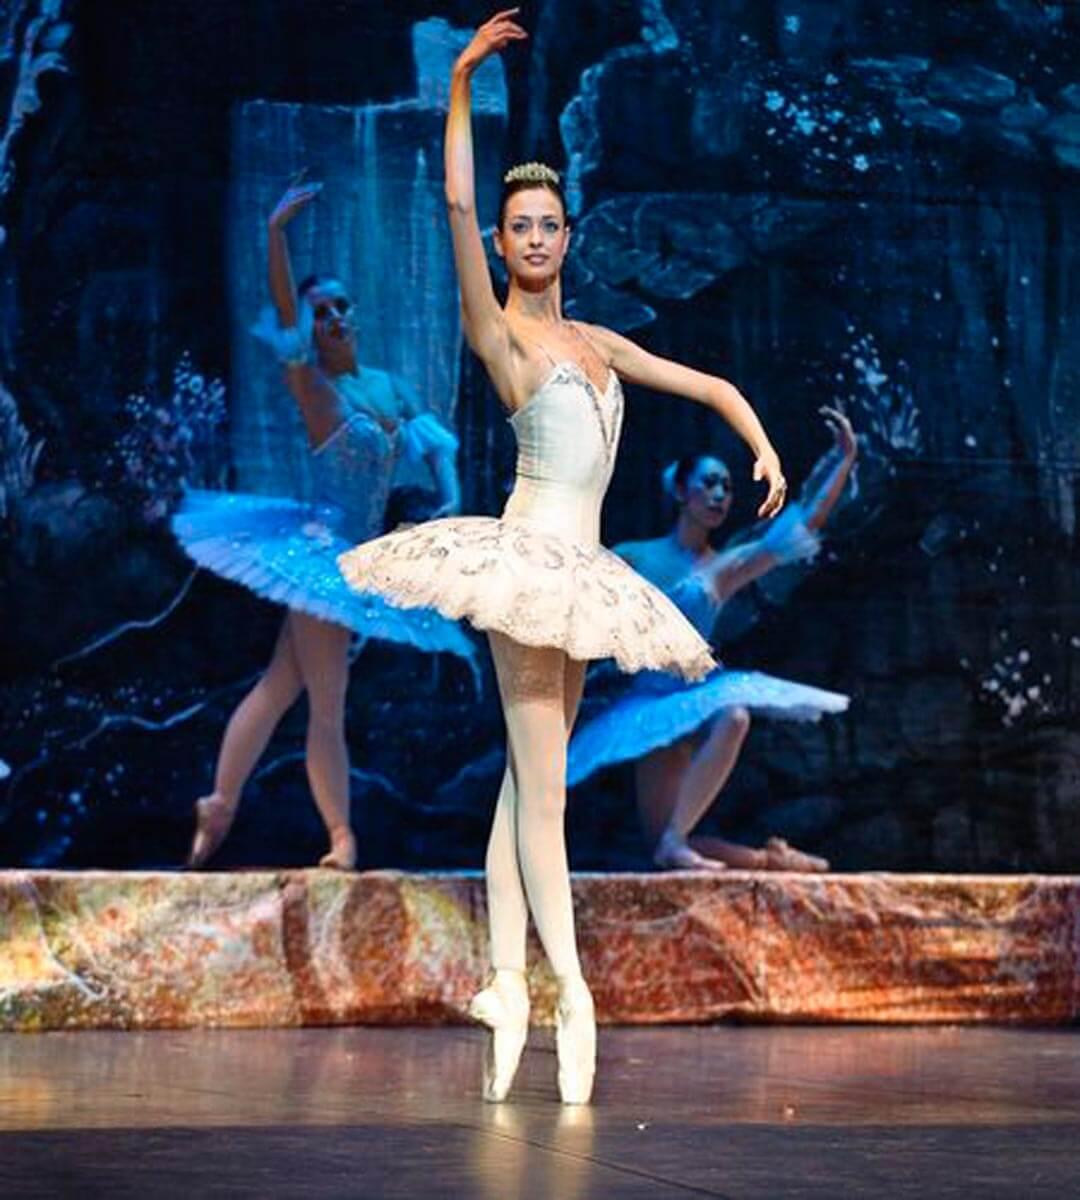 foto-veselie-balerini-video-kak-trahayut-tolstih-sisyastih-bab